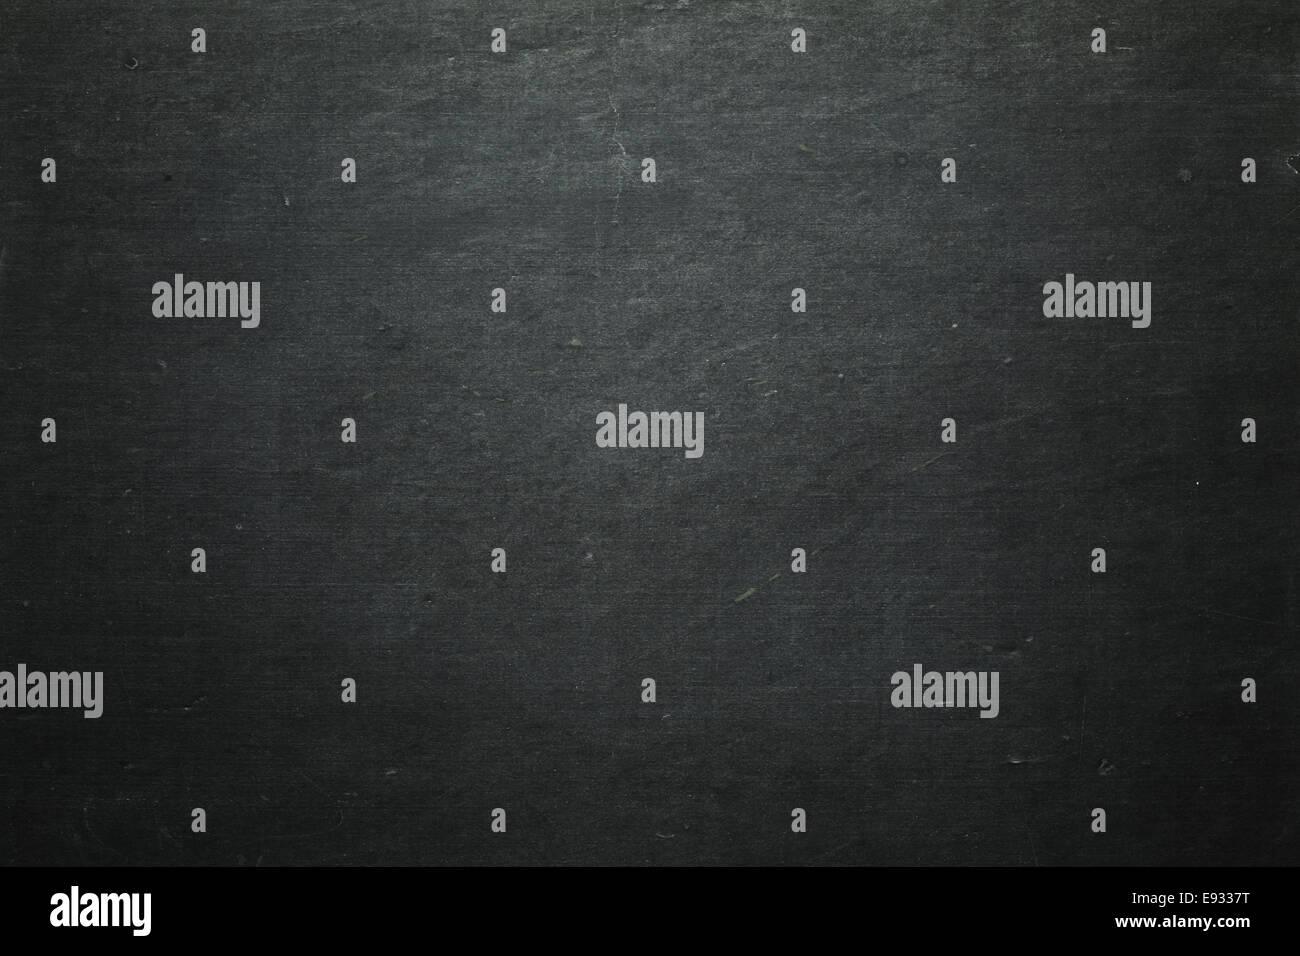 Blank chalkboard - Stock Image